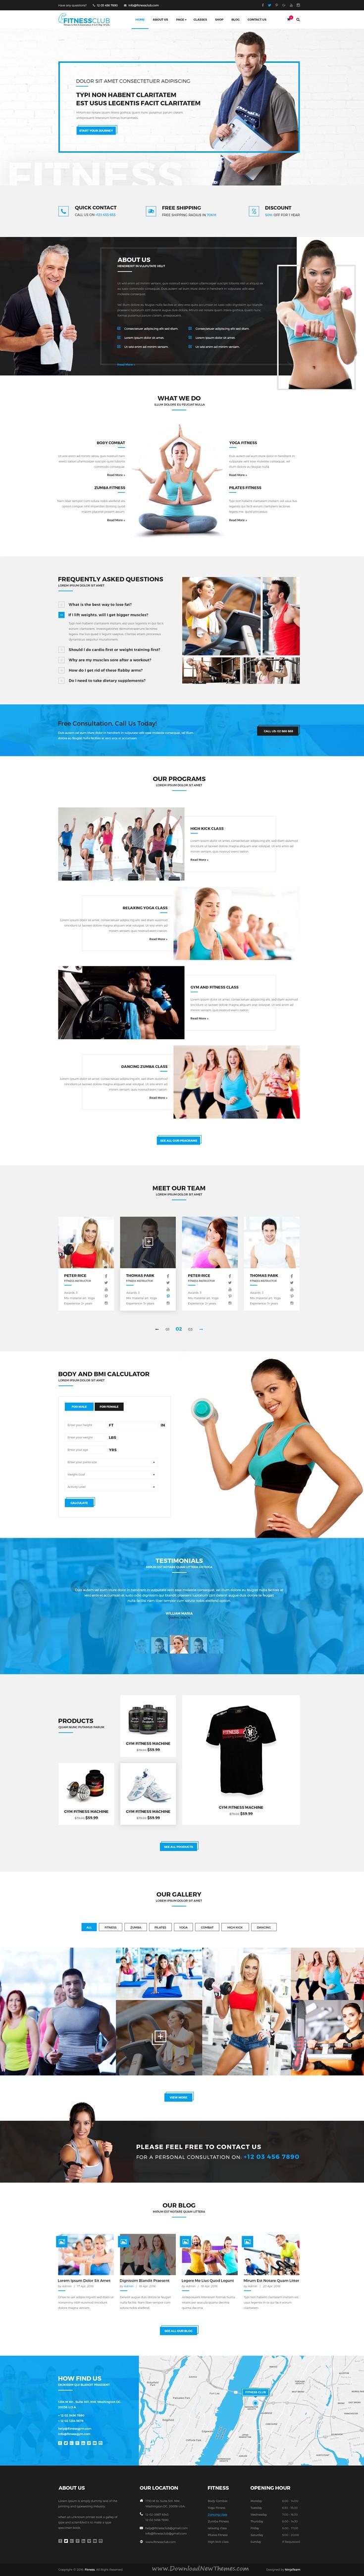 Fitnessclub Professional Gym Services Psd Psd Photoshop Fitness Club